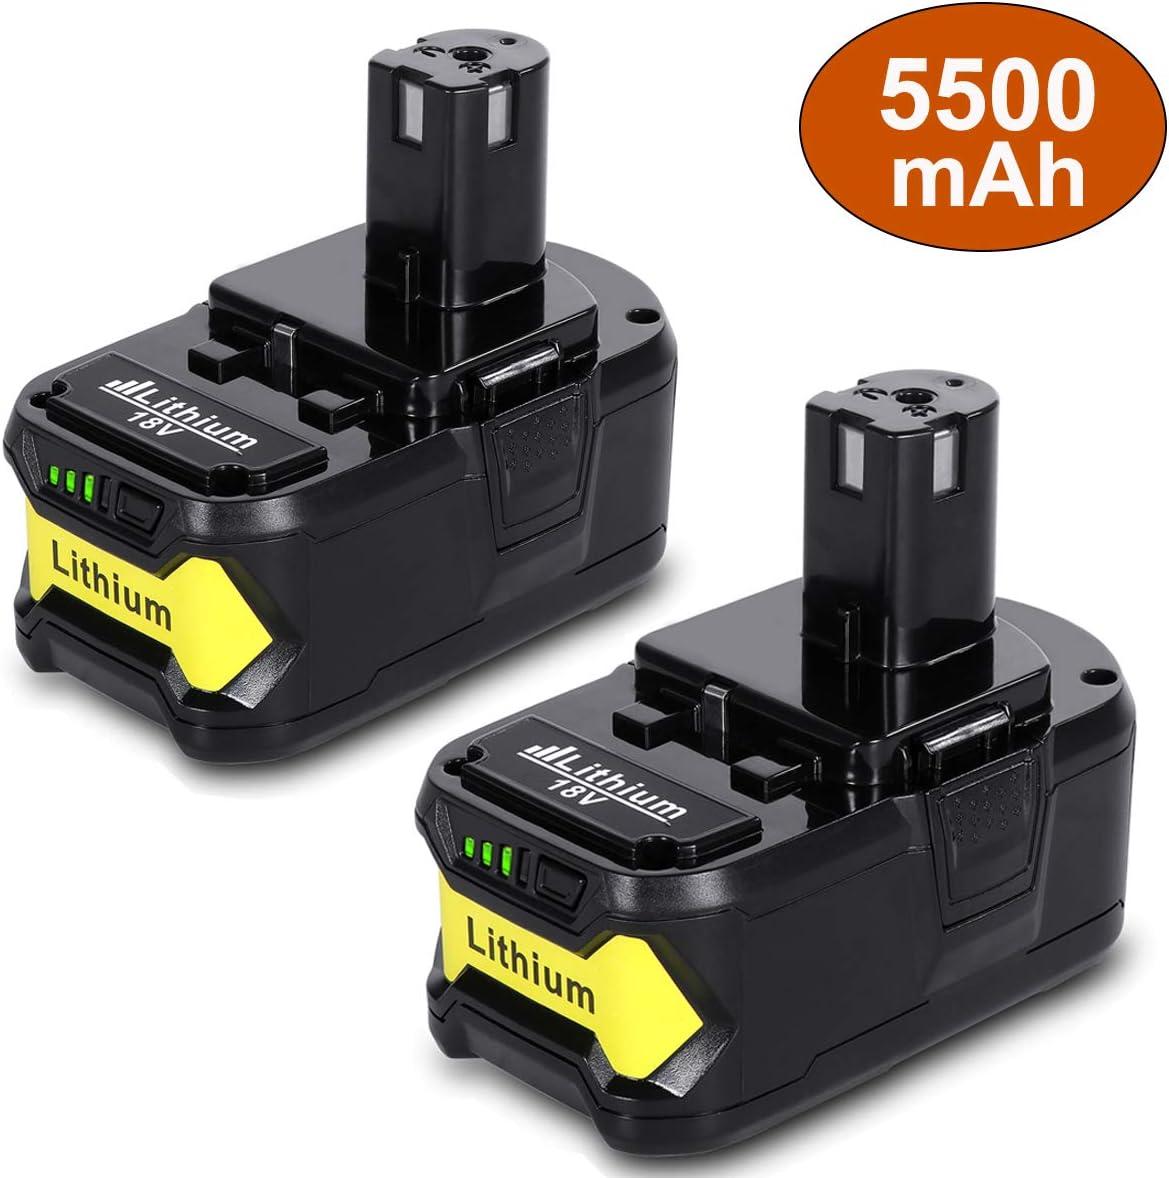 4.0Ah For Ryobi ONE PLUS P108 P107 P102 P100 BPL-1820 18V Lithium-ion Batterie